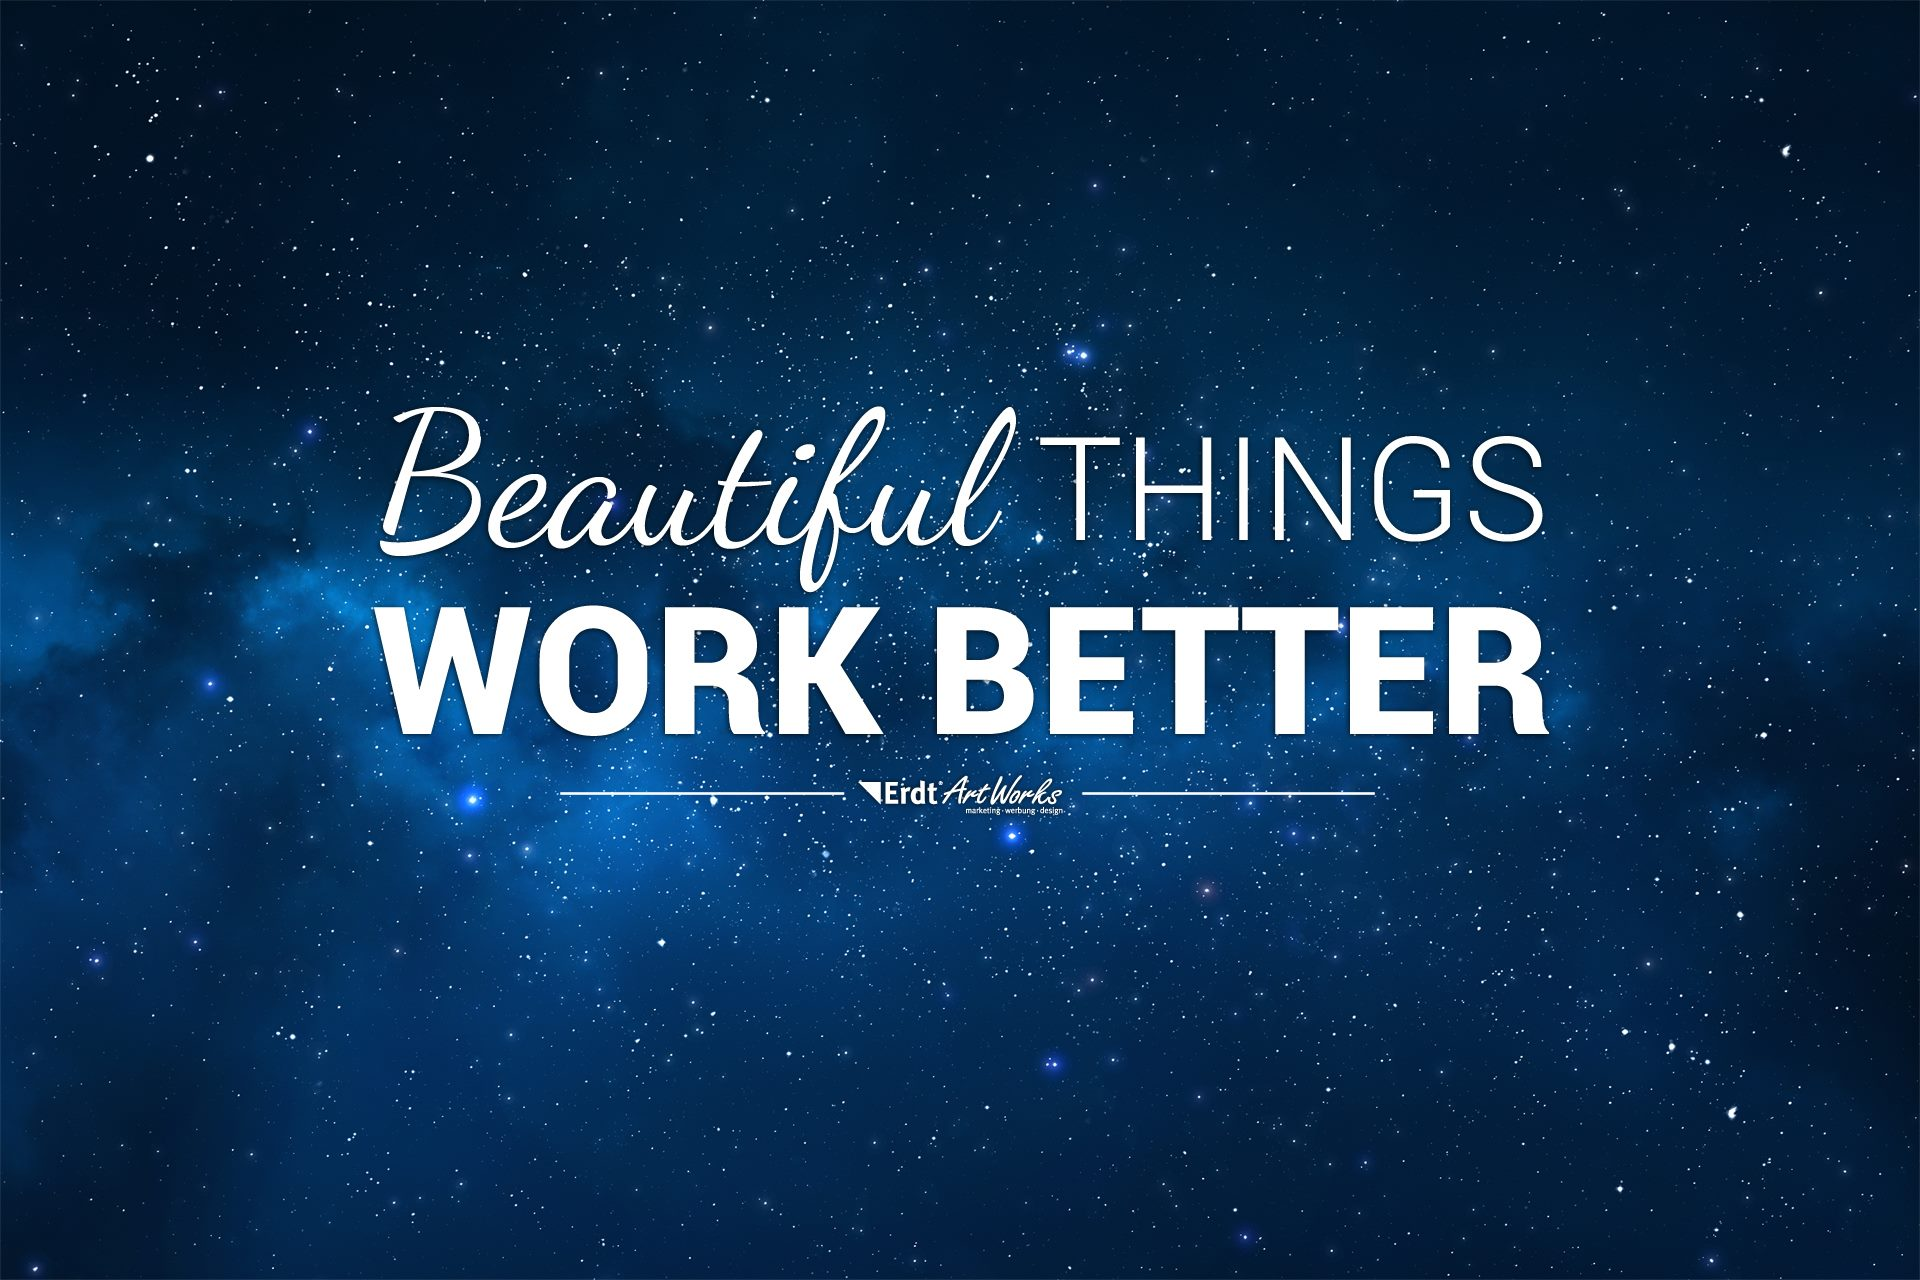 Beautiful things work better!